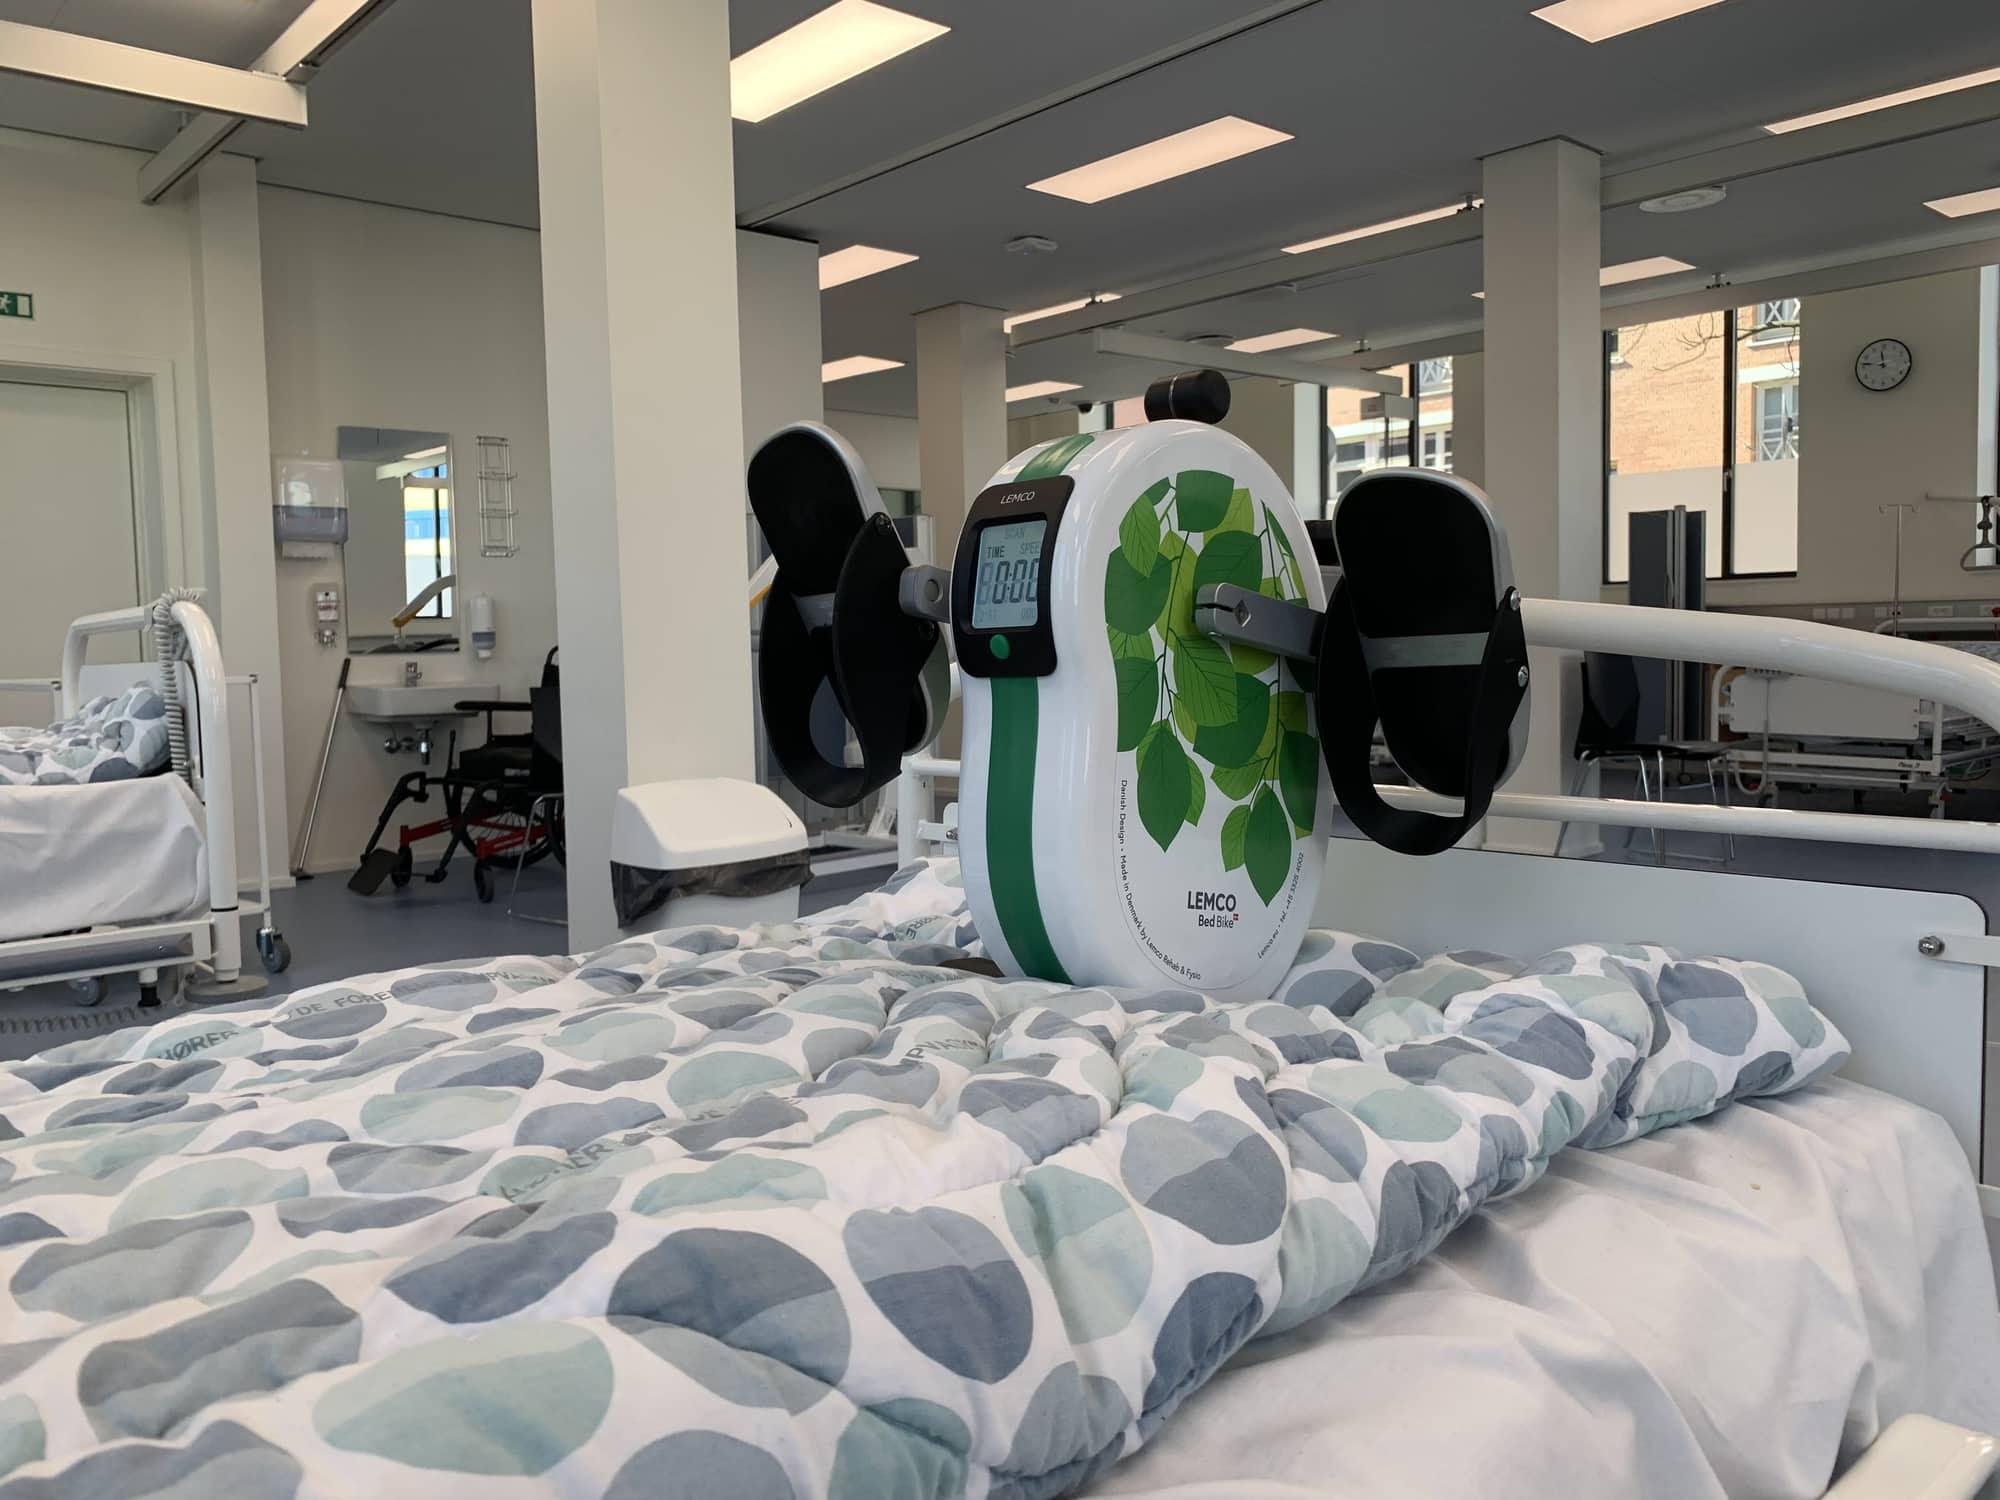 Bed Exerciser / Bed Pedal Exerciser for hospital beds.